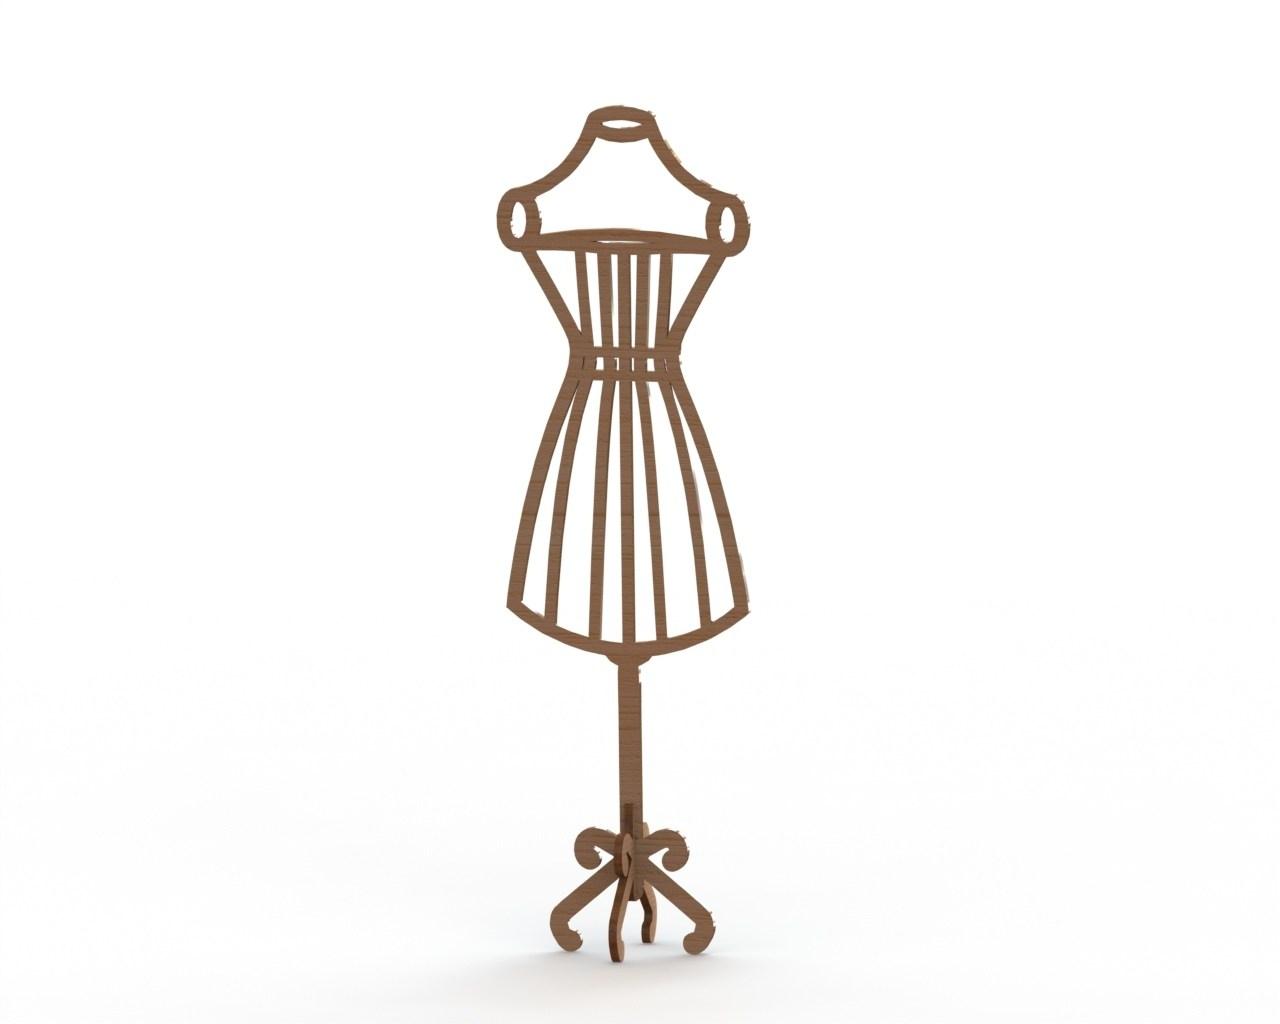 1280x1024 Dress Form Mannequin Mdf Laser Cut 6mm Download Free Vector For